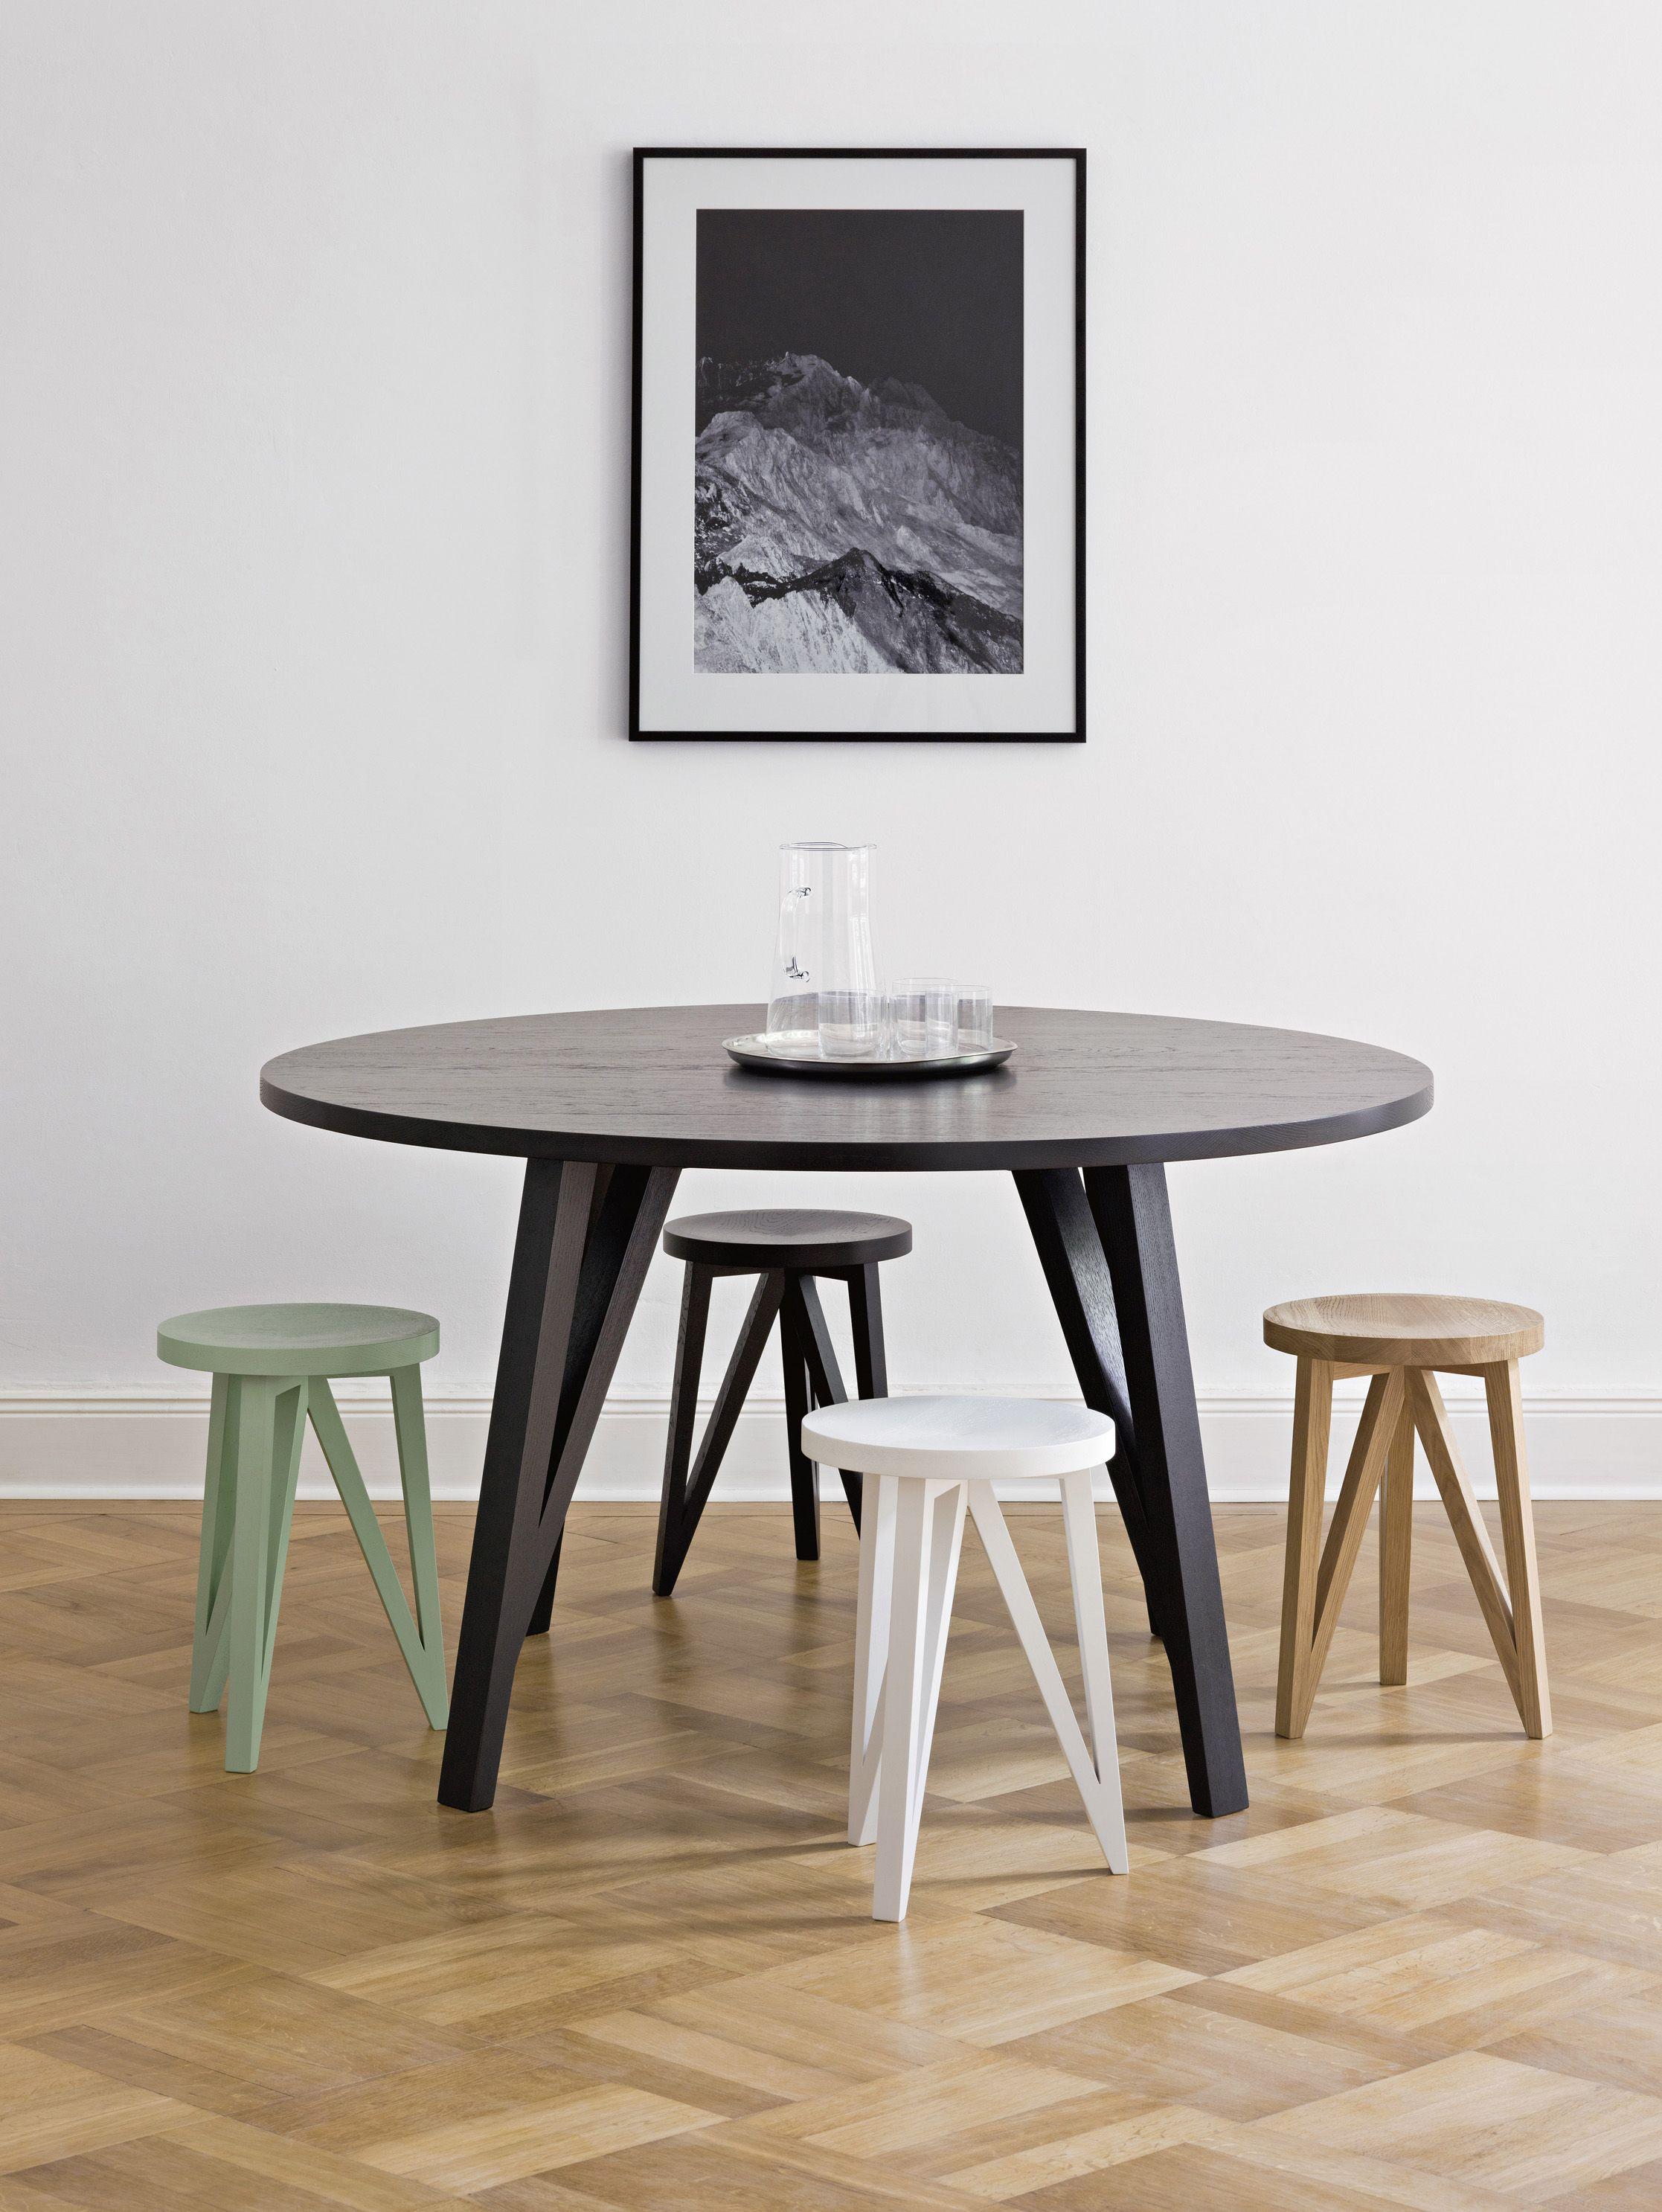 al s chairs and tables big man sitting around als fortfuhrung der faber mobelserie ahnelt die geometrische form des sabeth table round holzbalkenkonstruktion traditioneller